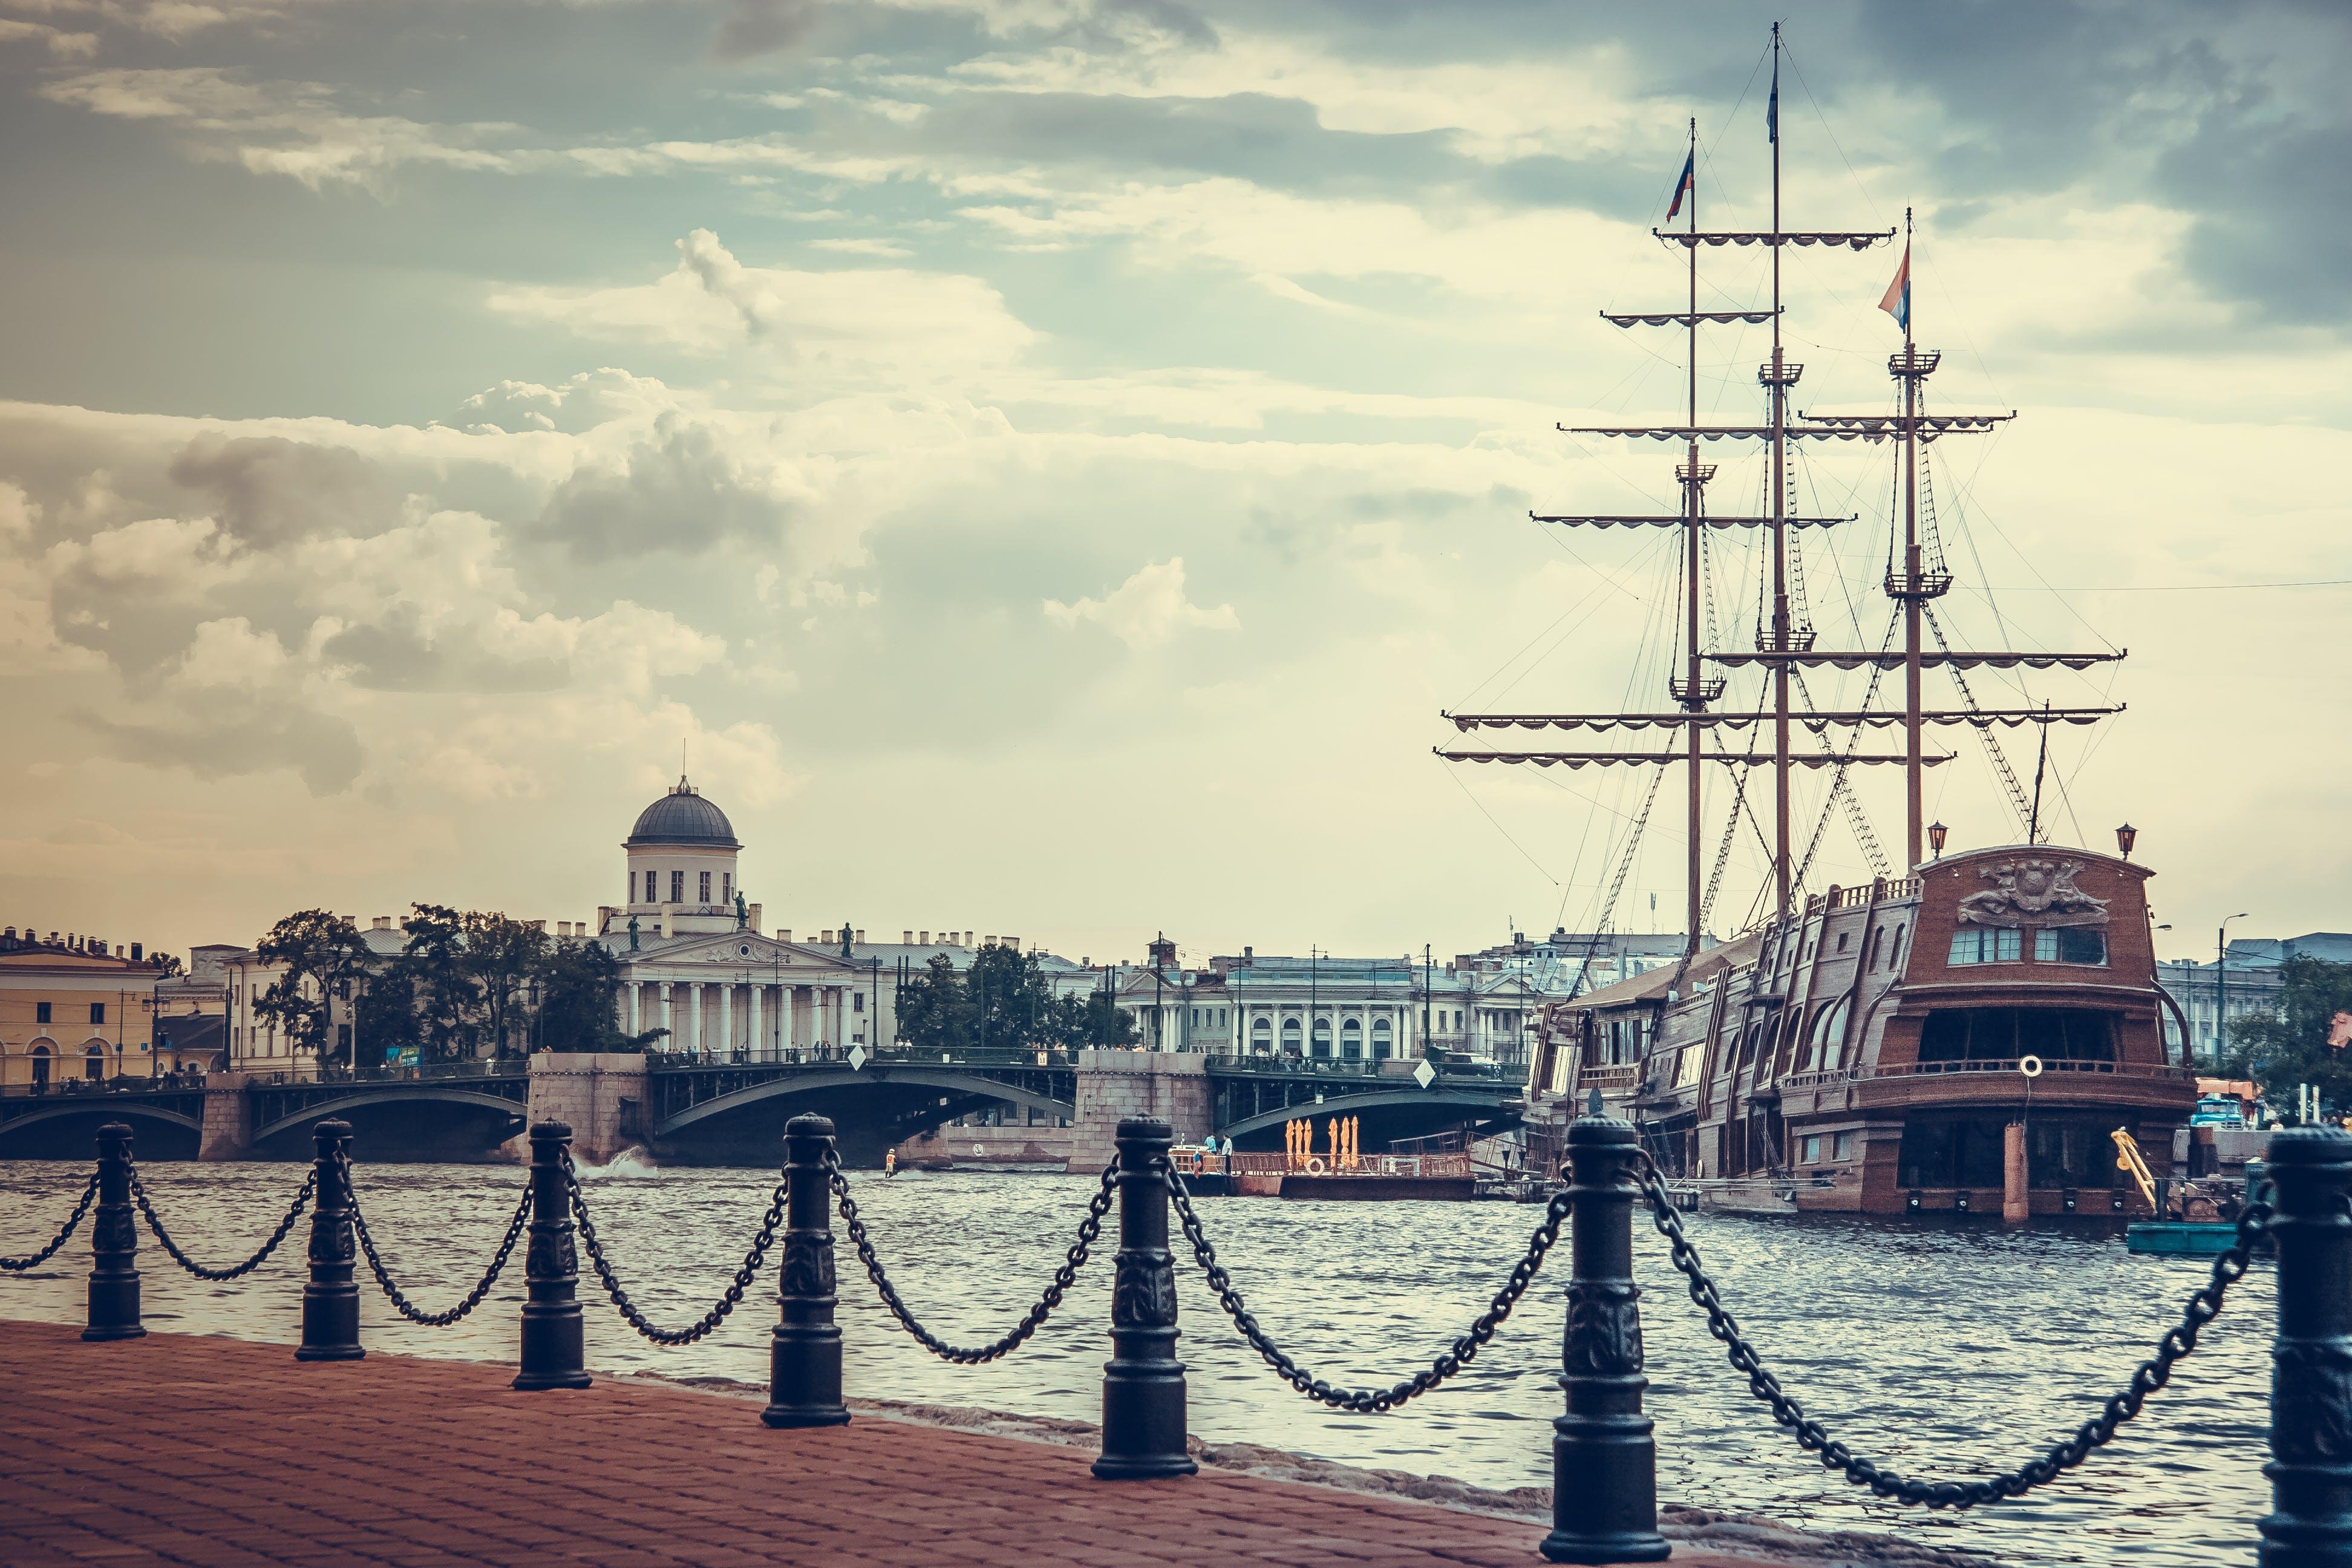 Brown Ship Beside Dock